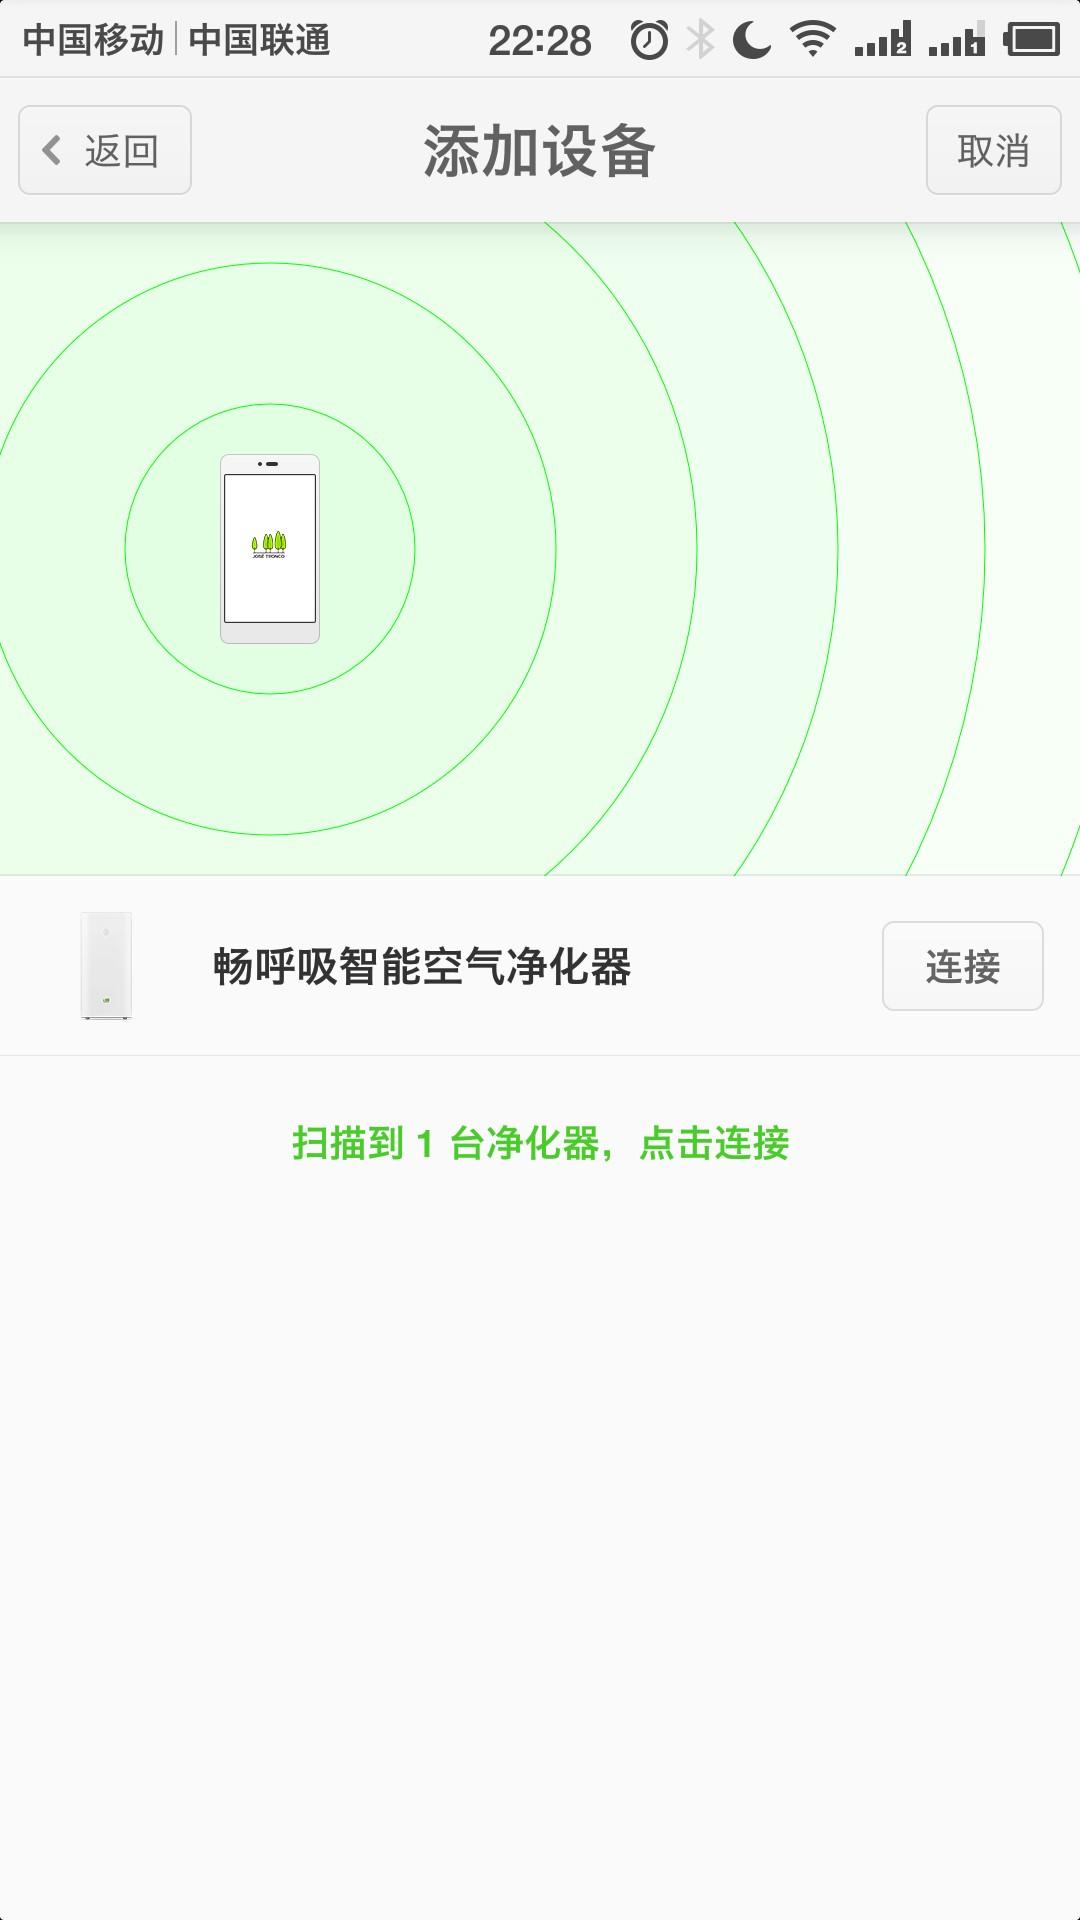 Screenshot_2018-04-20-22-28-27-865_???.png